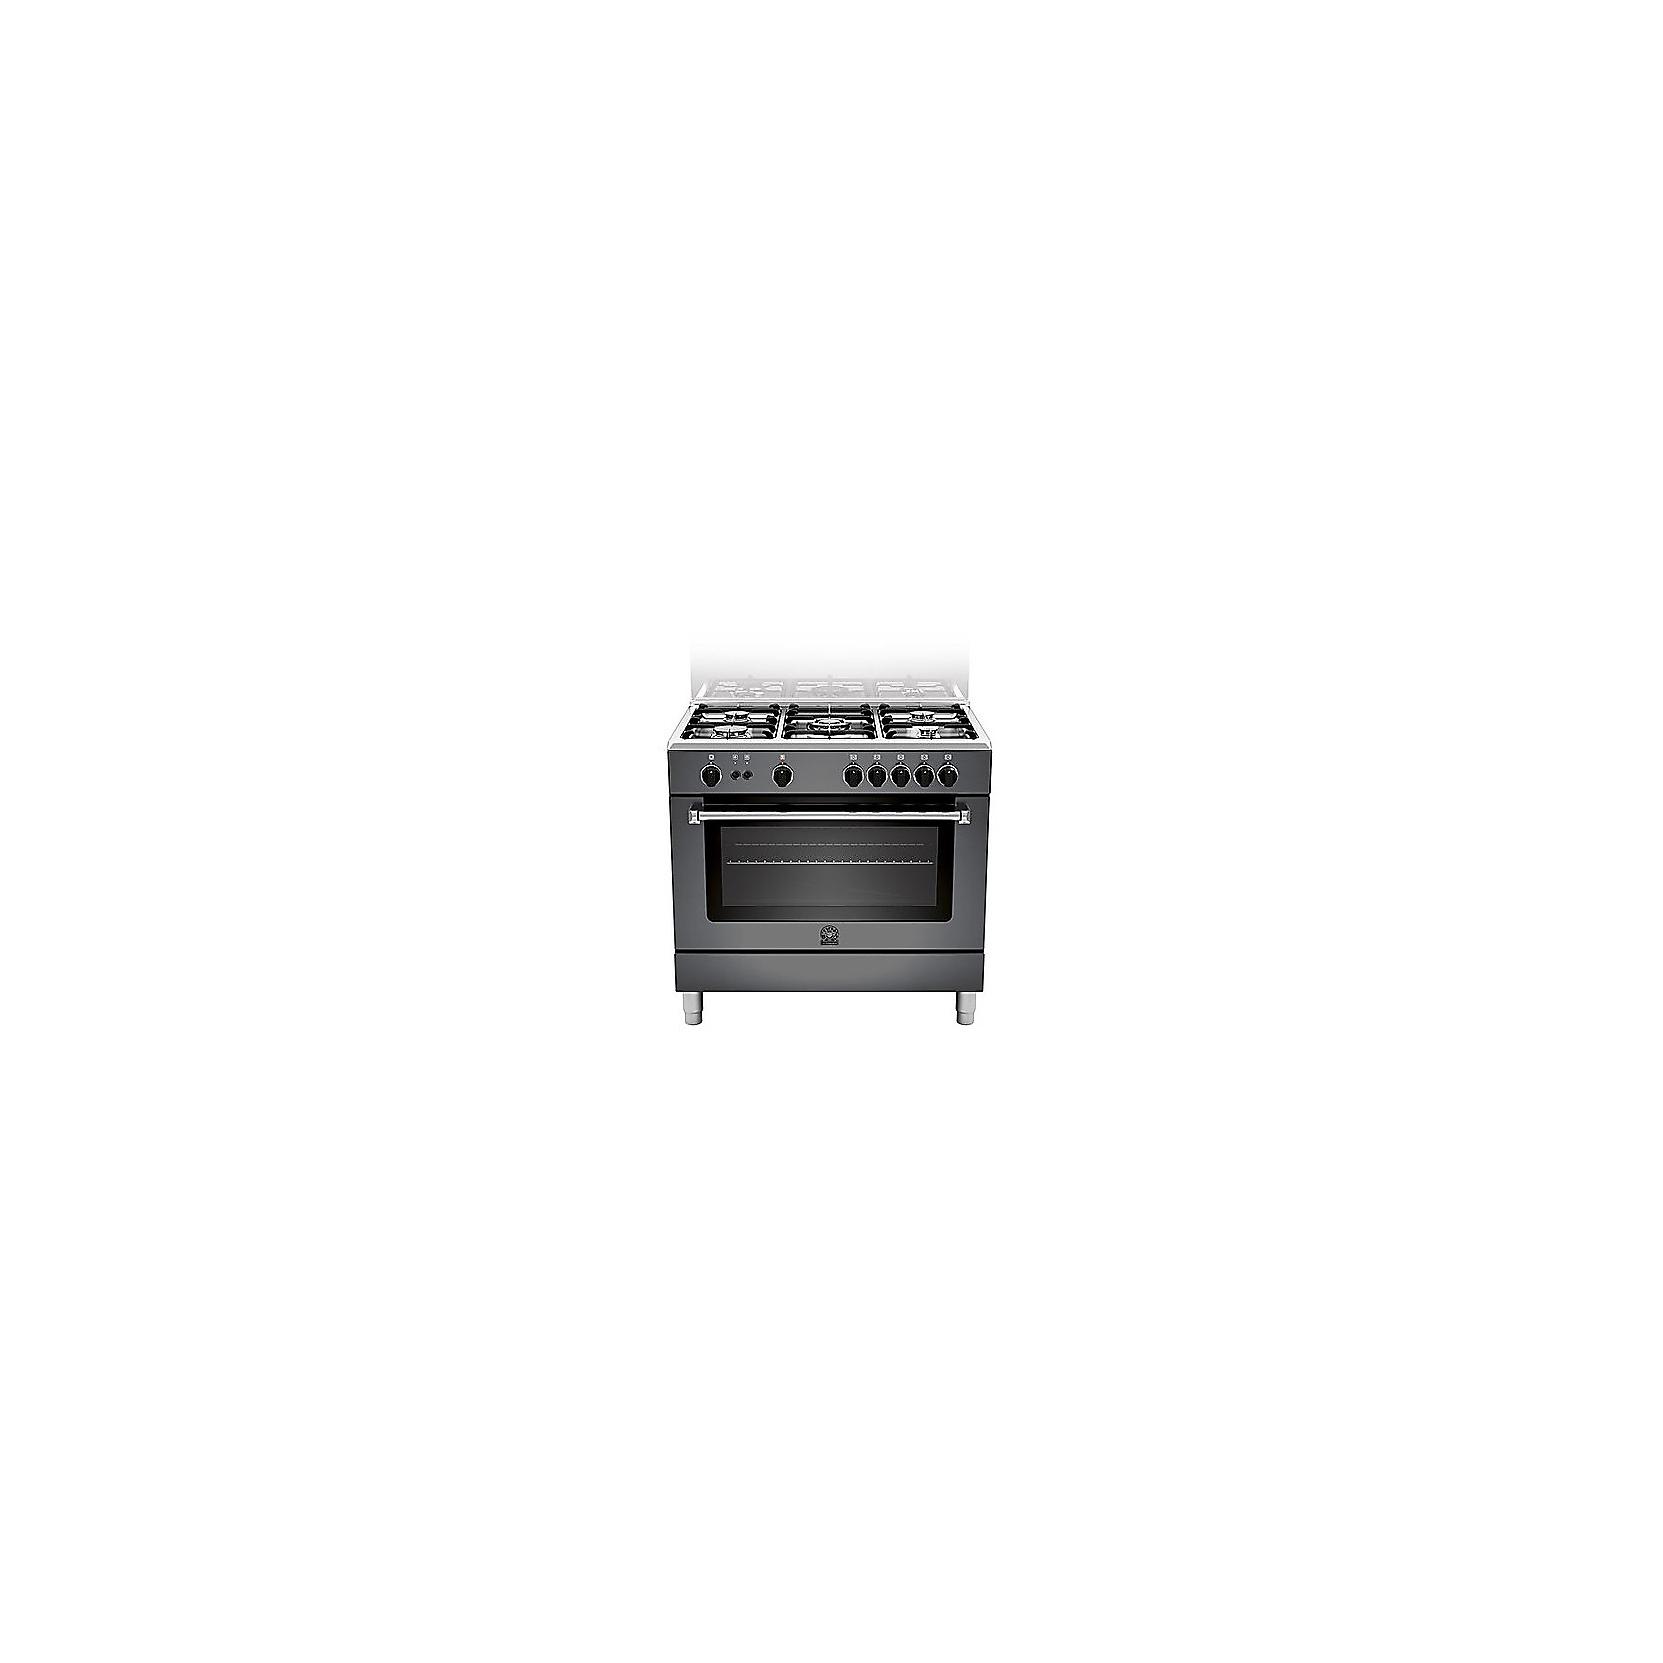 Cucina la germania am95c71cne 90x60 nera 5 fuochi forno a - Cucine a gas la germania ...